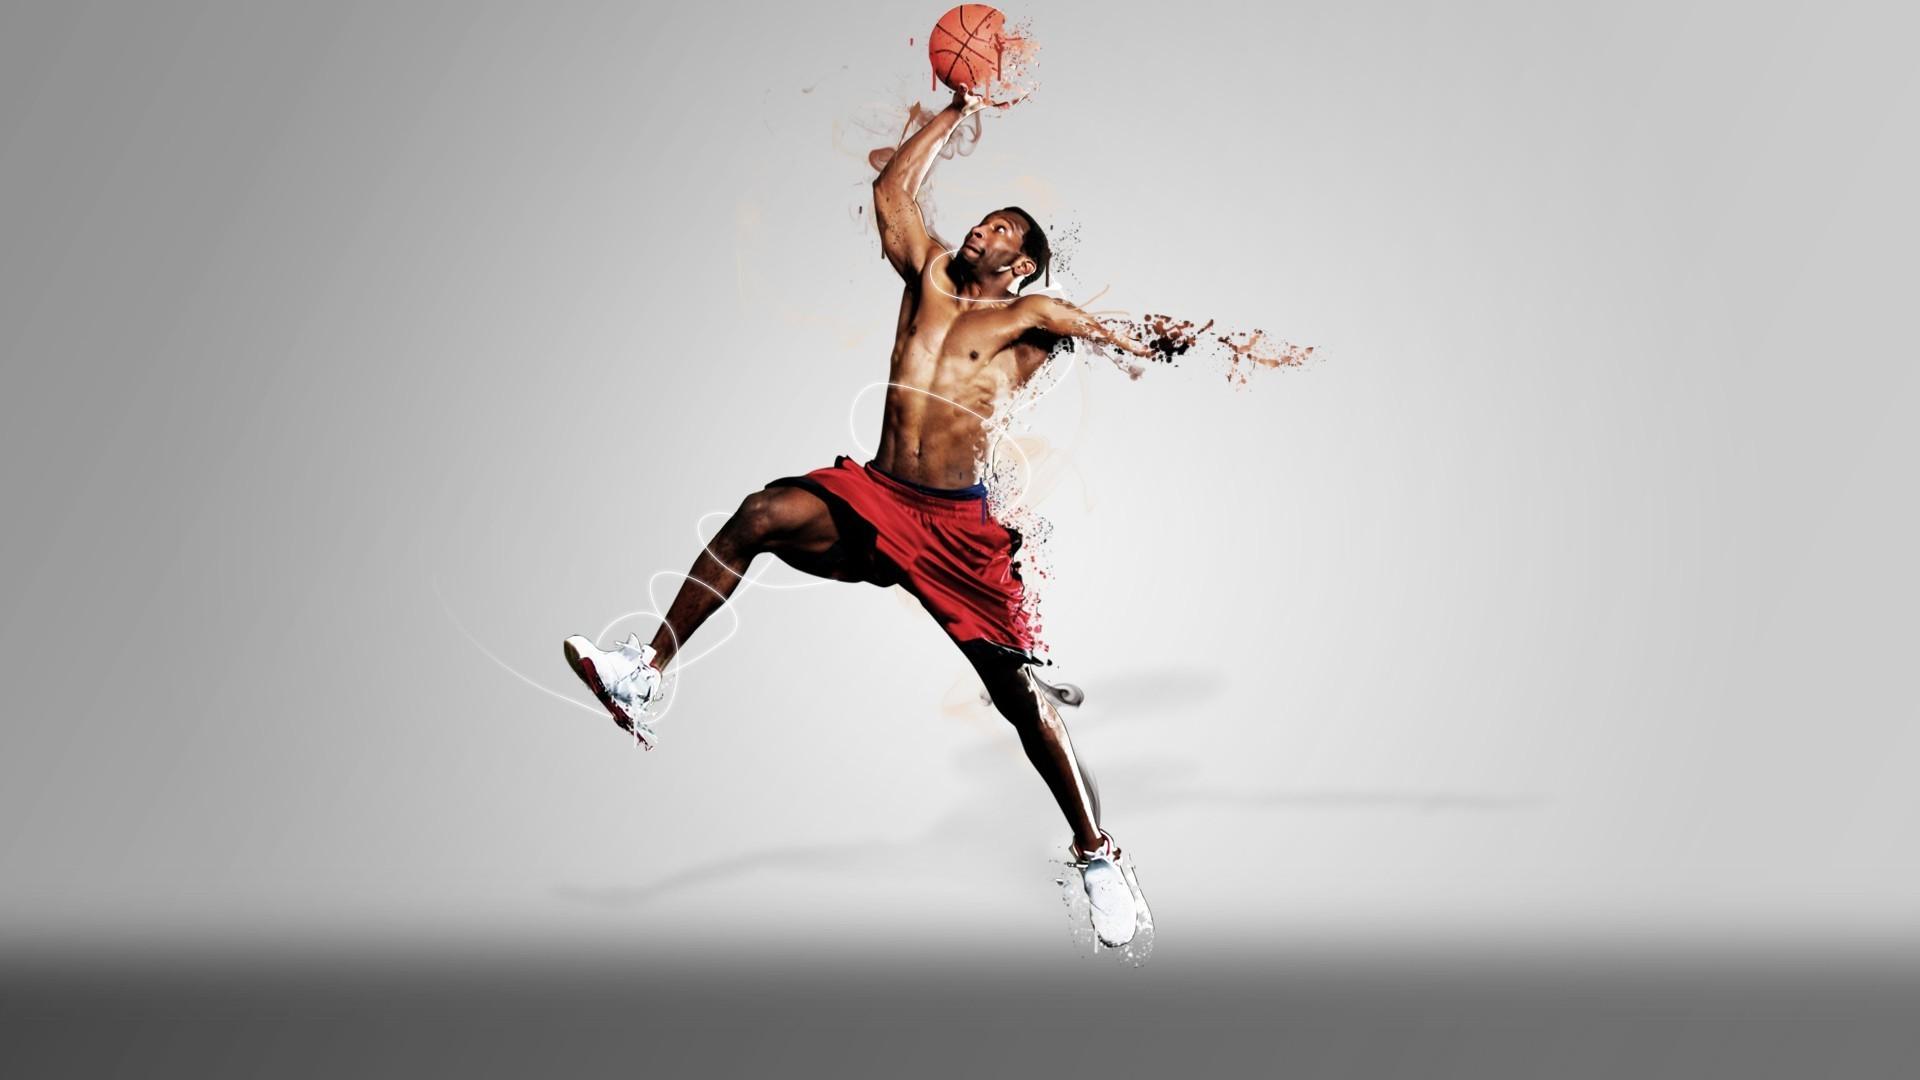 Basketball Players Wallpapers  WallpaperSafari